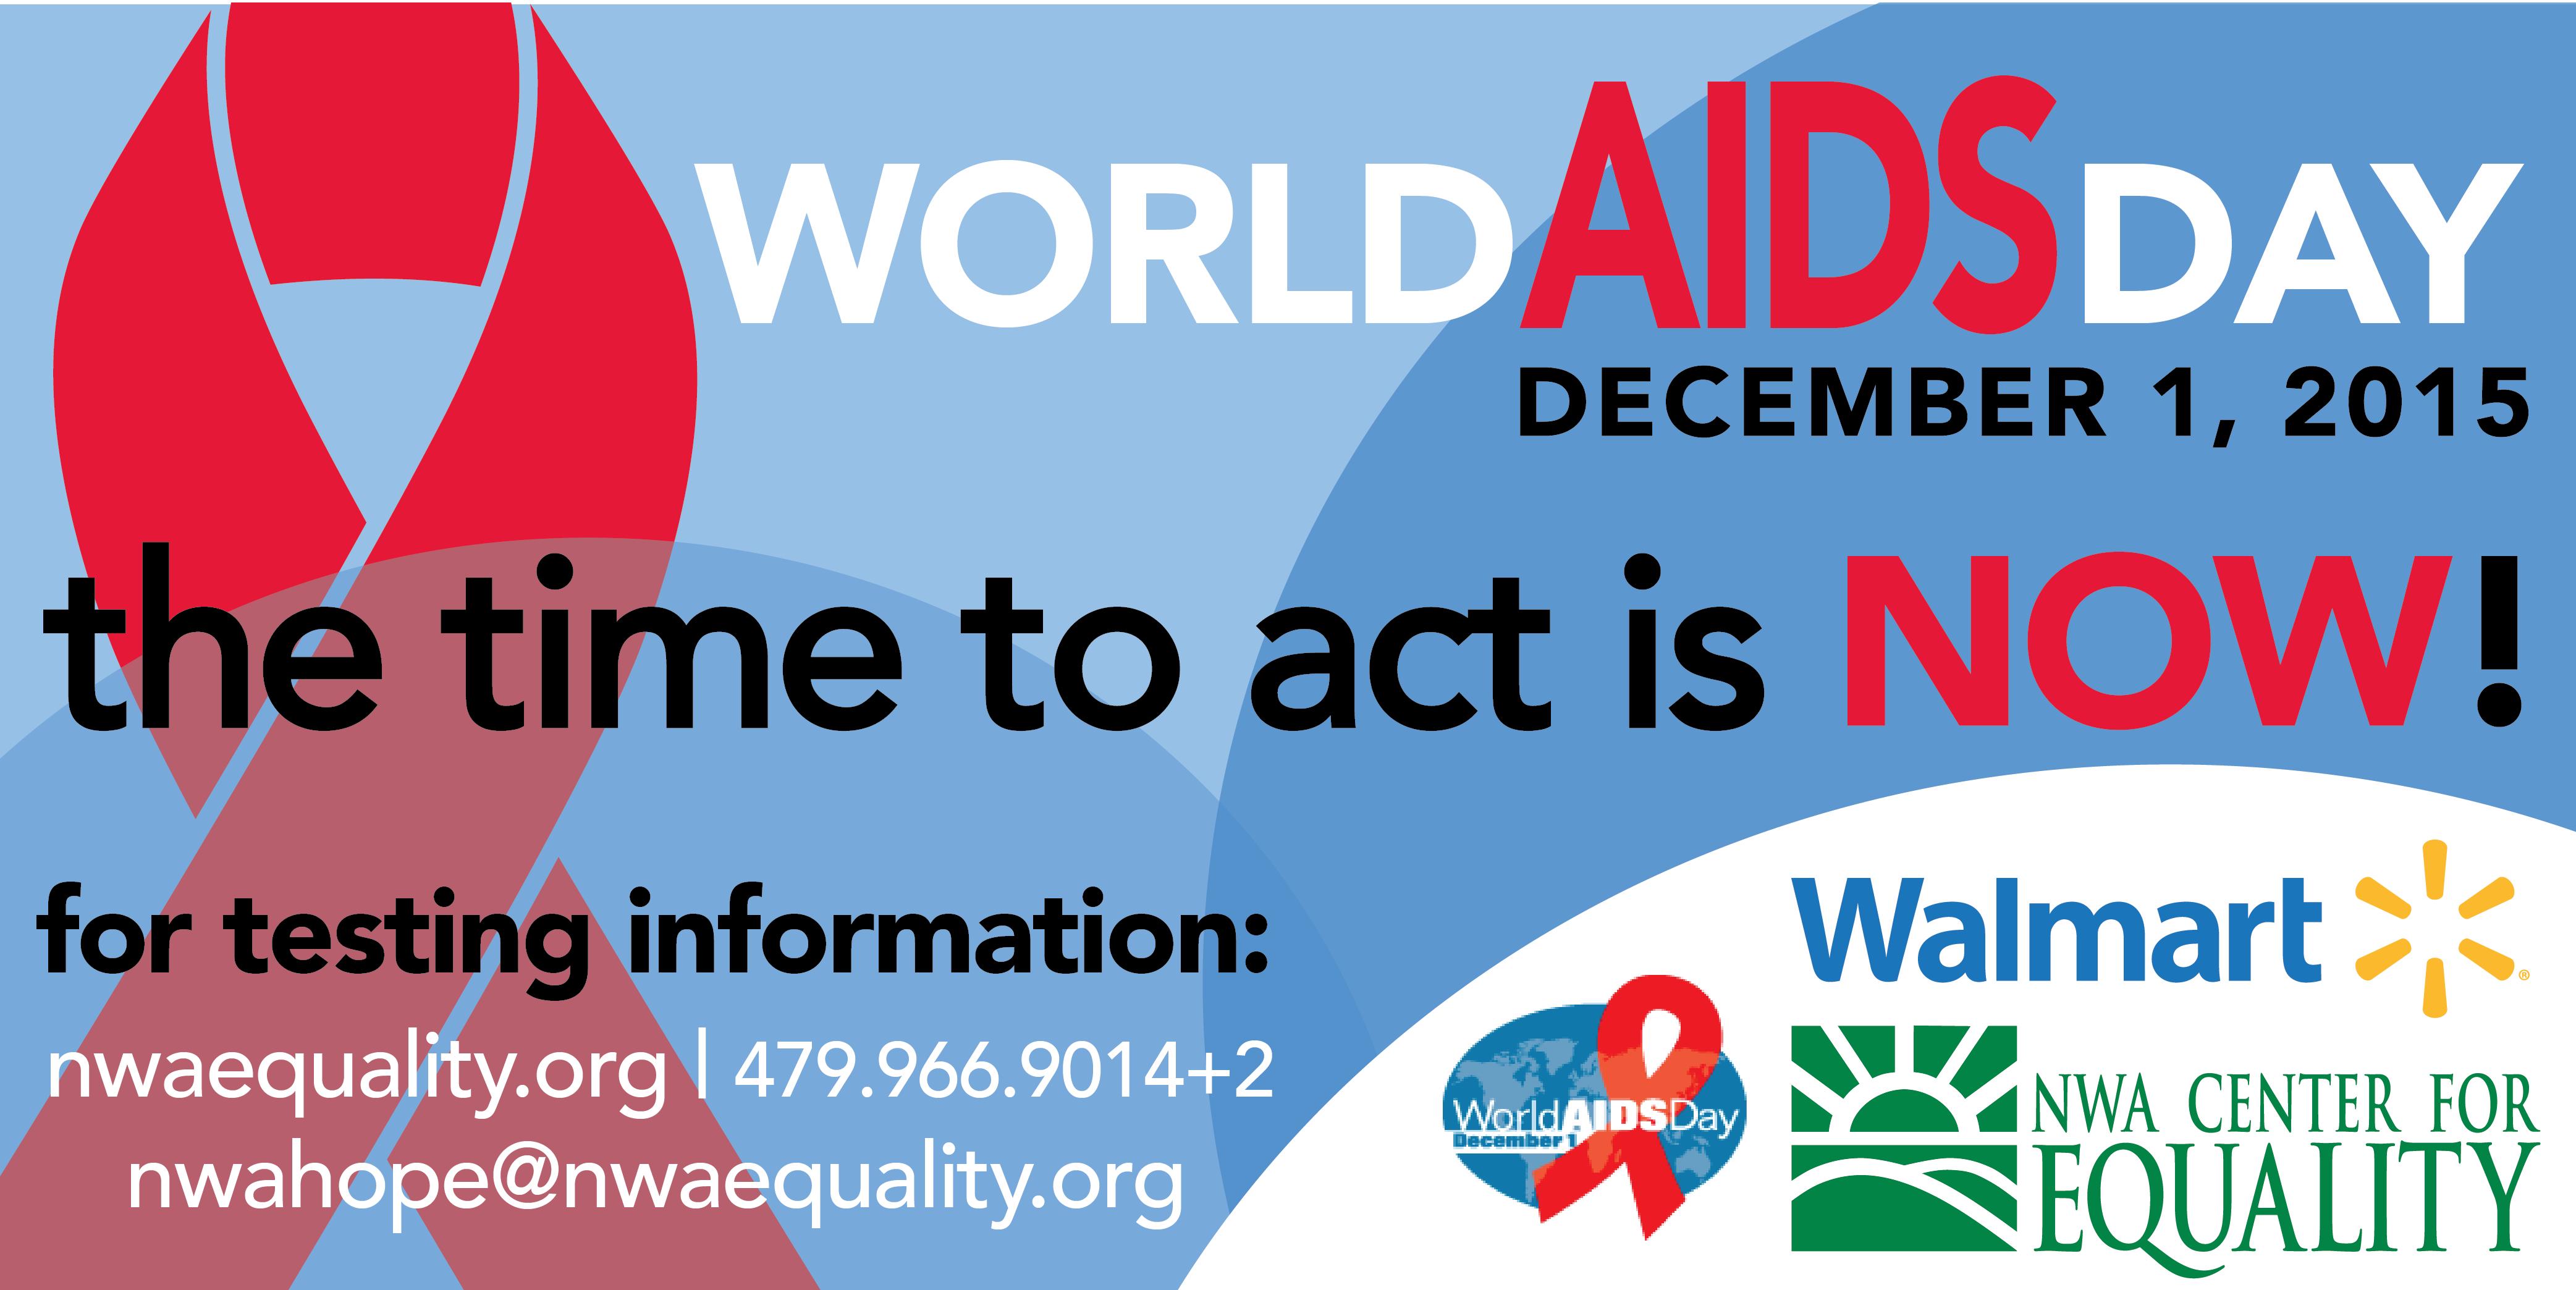 CC-2015-12-WAD AD-Website-01-01